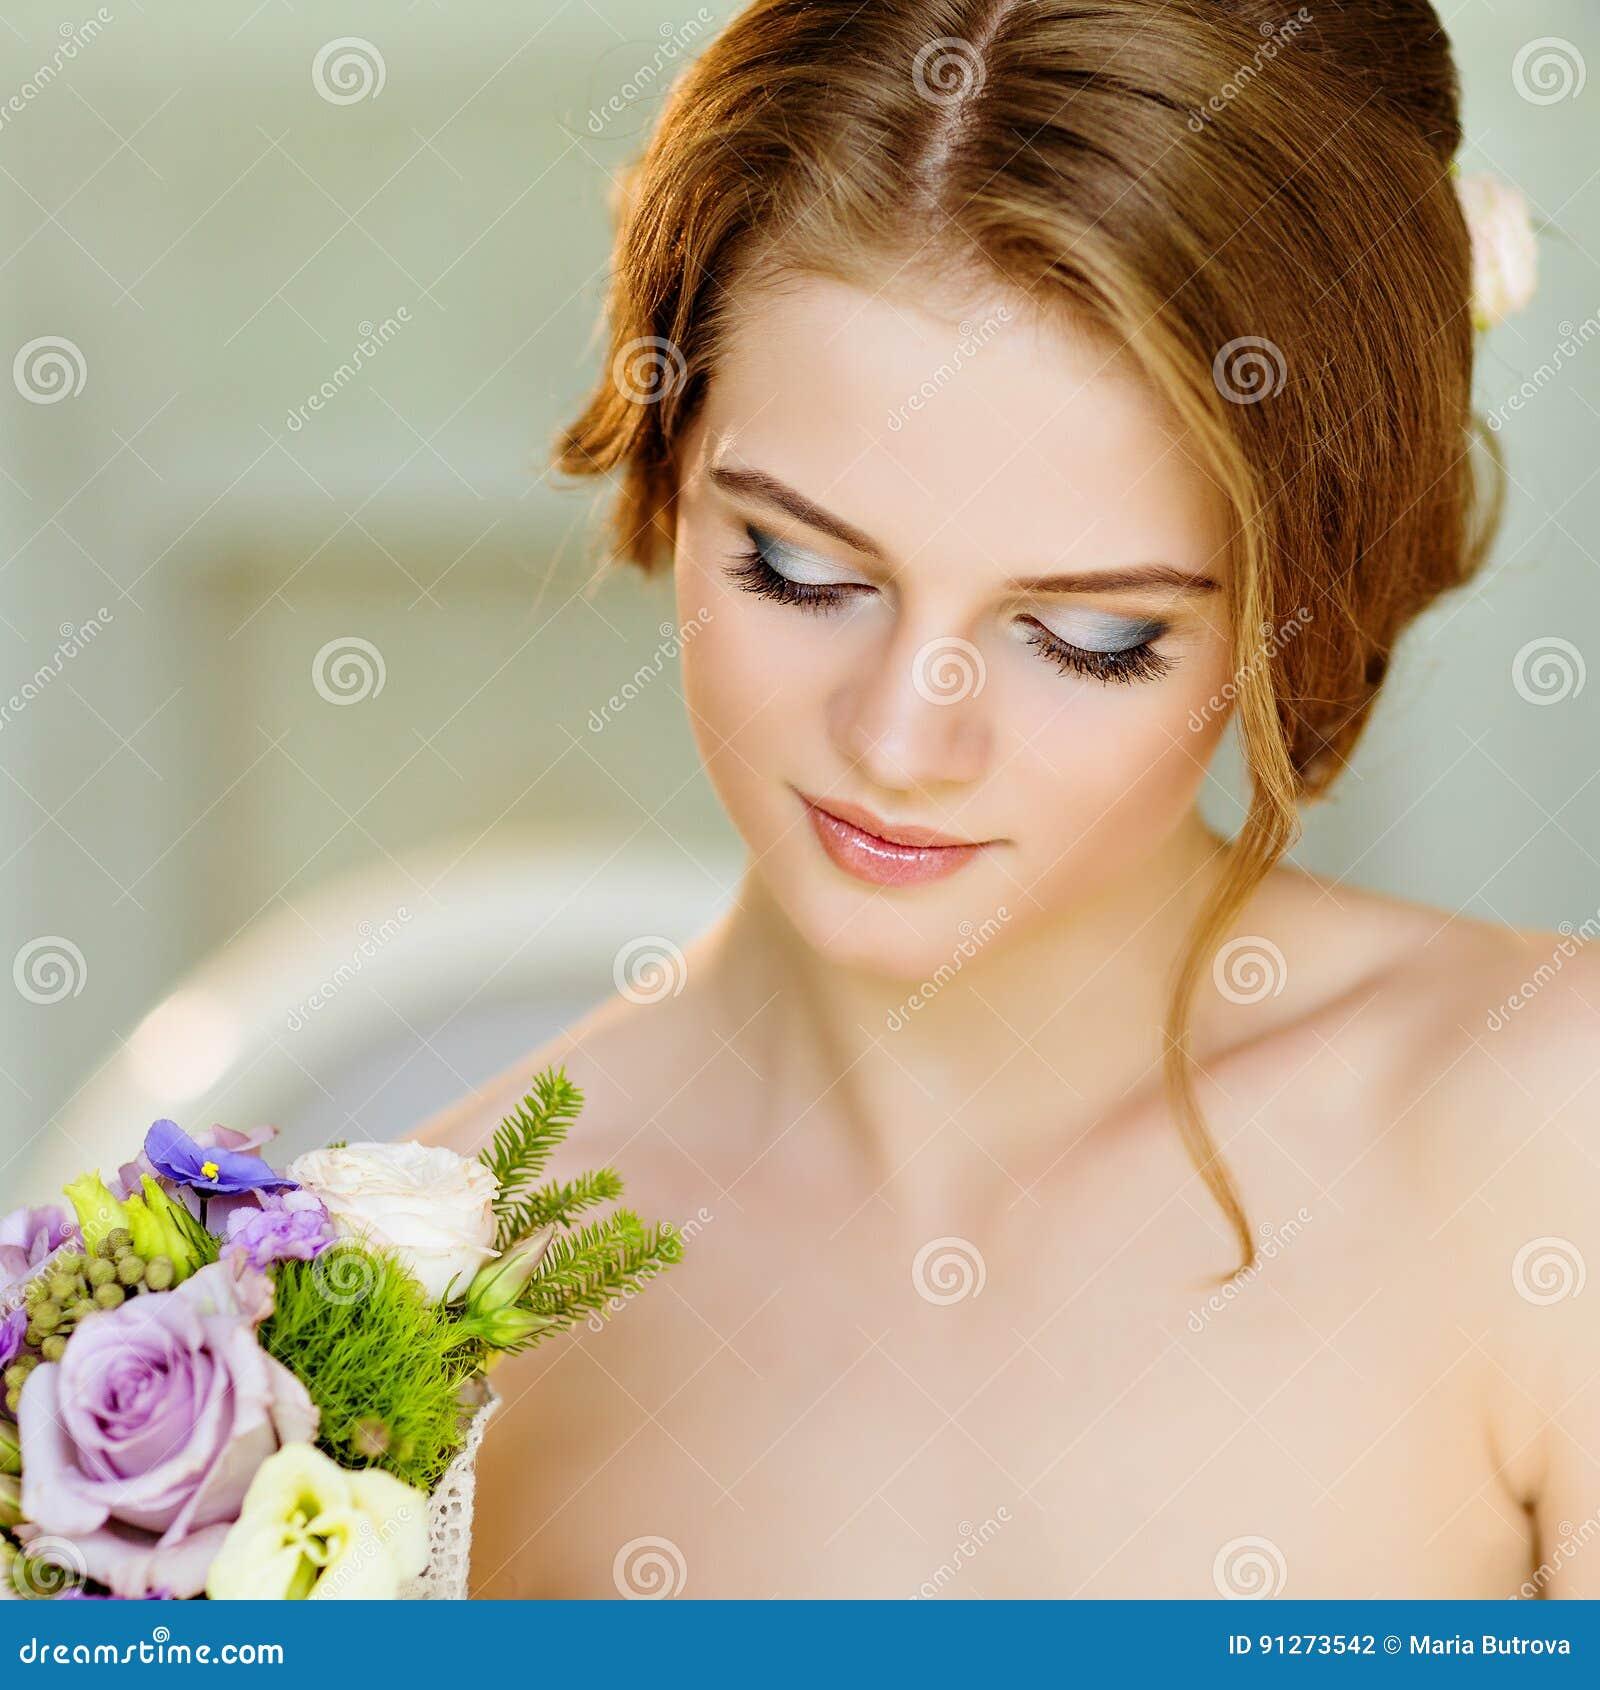 Very very cute girl